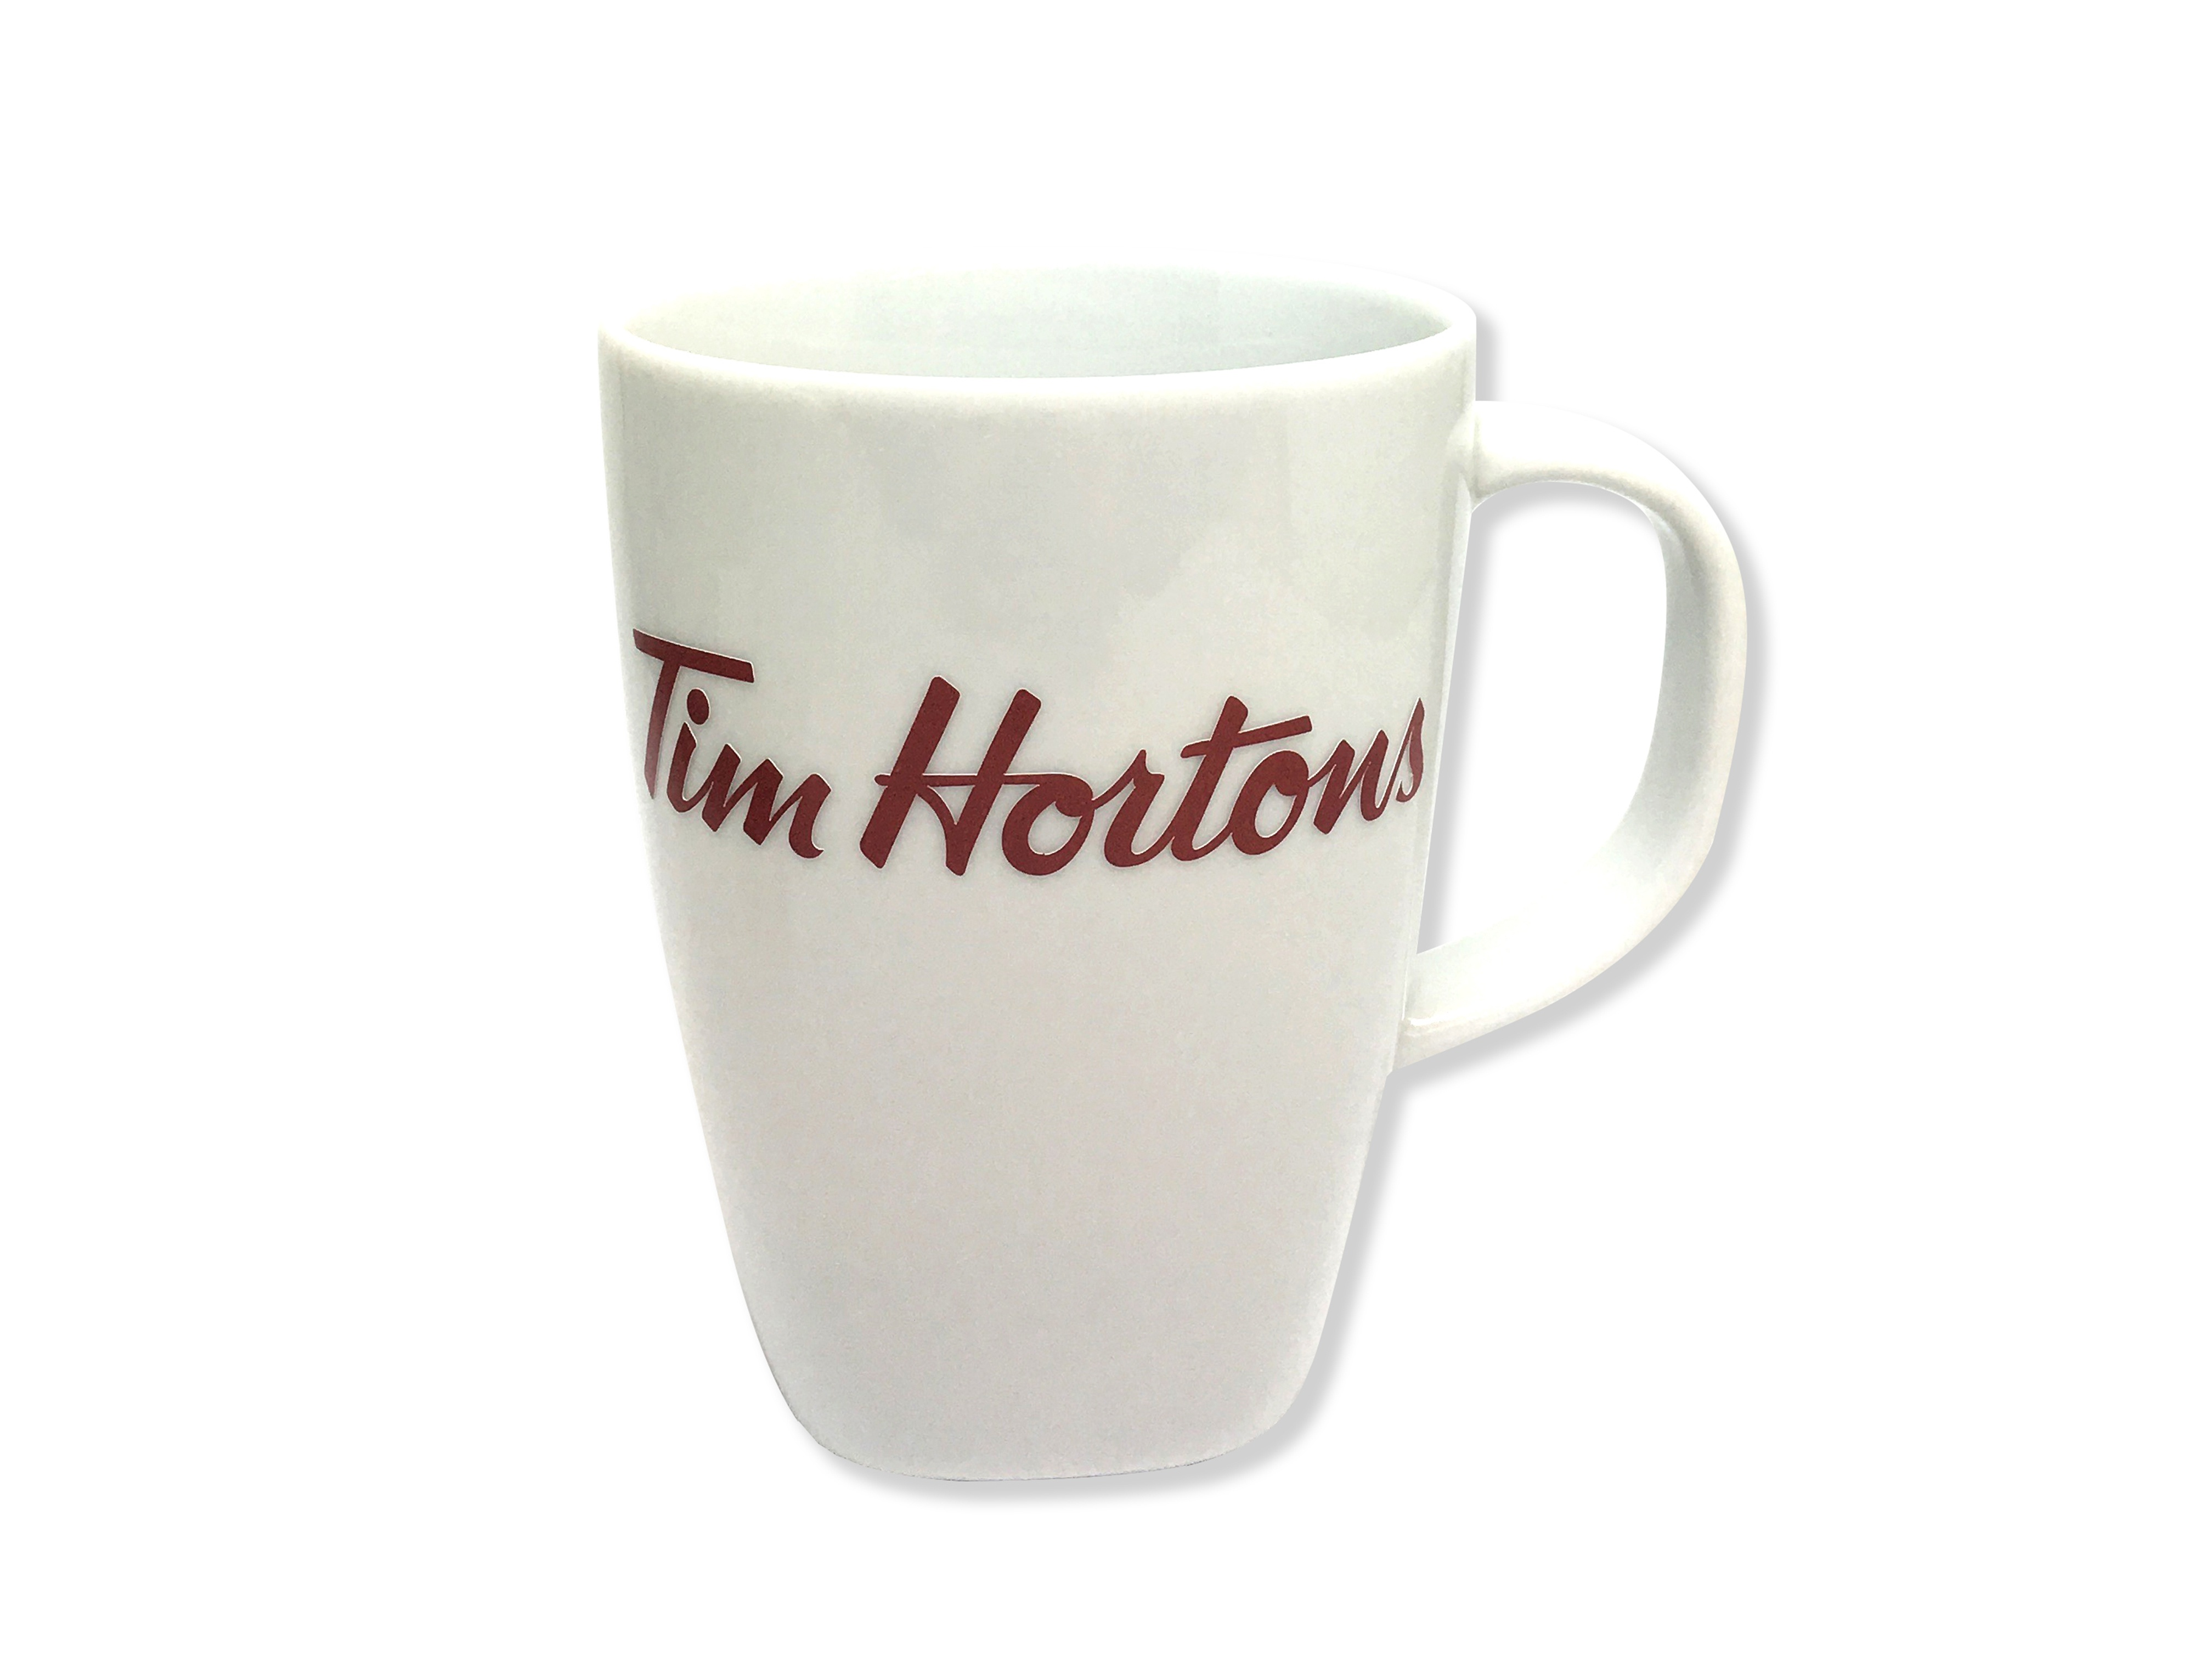 https://0901.nccdn.net/4_2/000/000/056/7dc/timhorton-cup-4032x3023.jpg